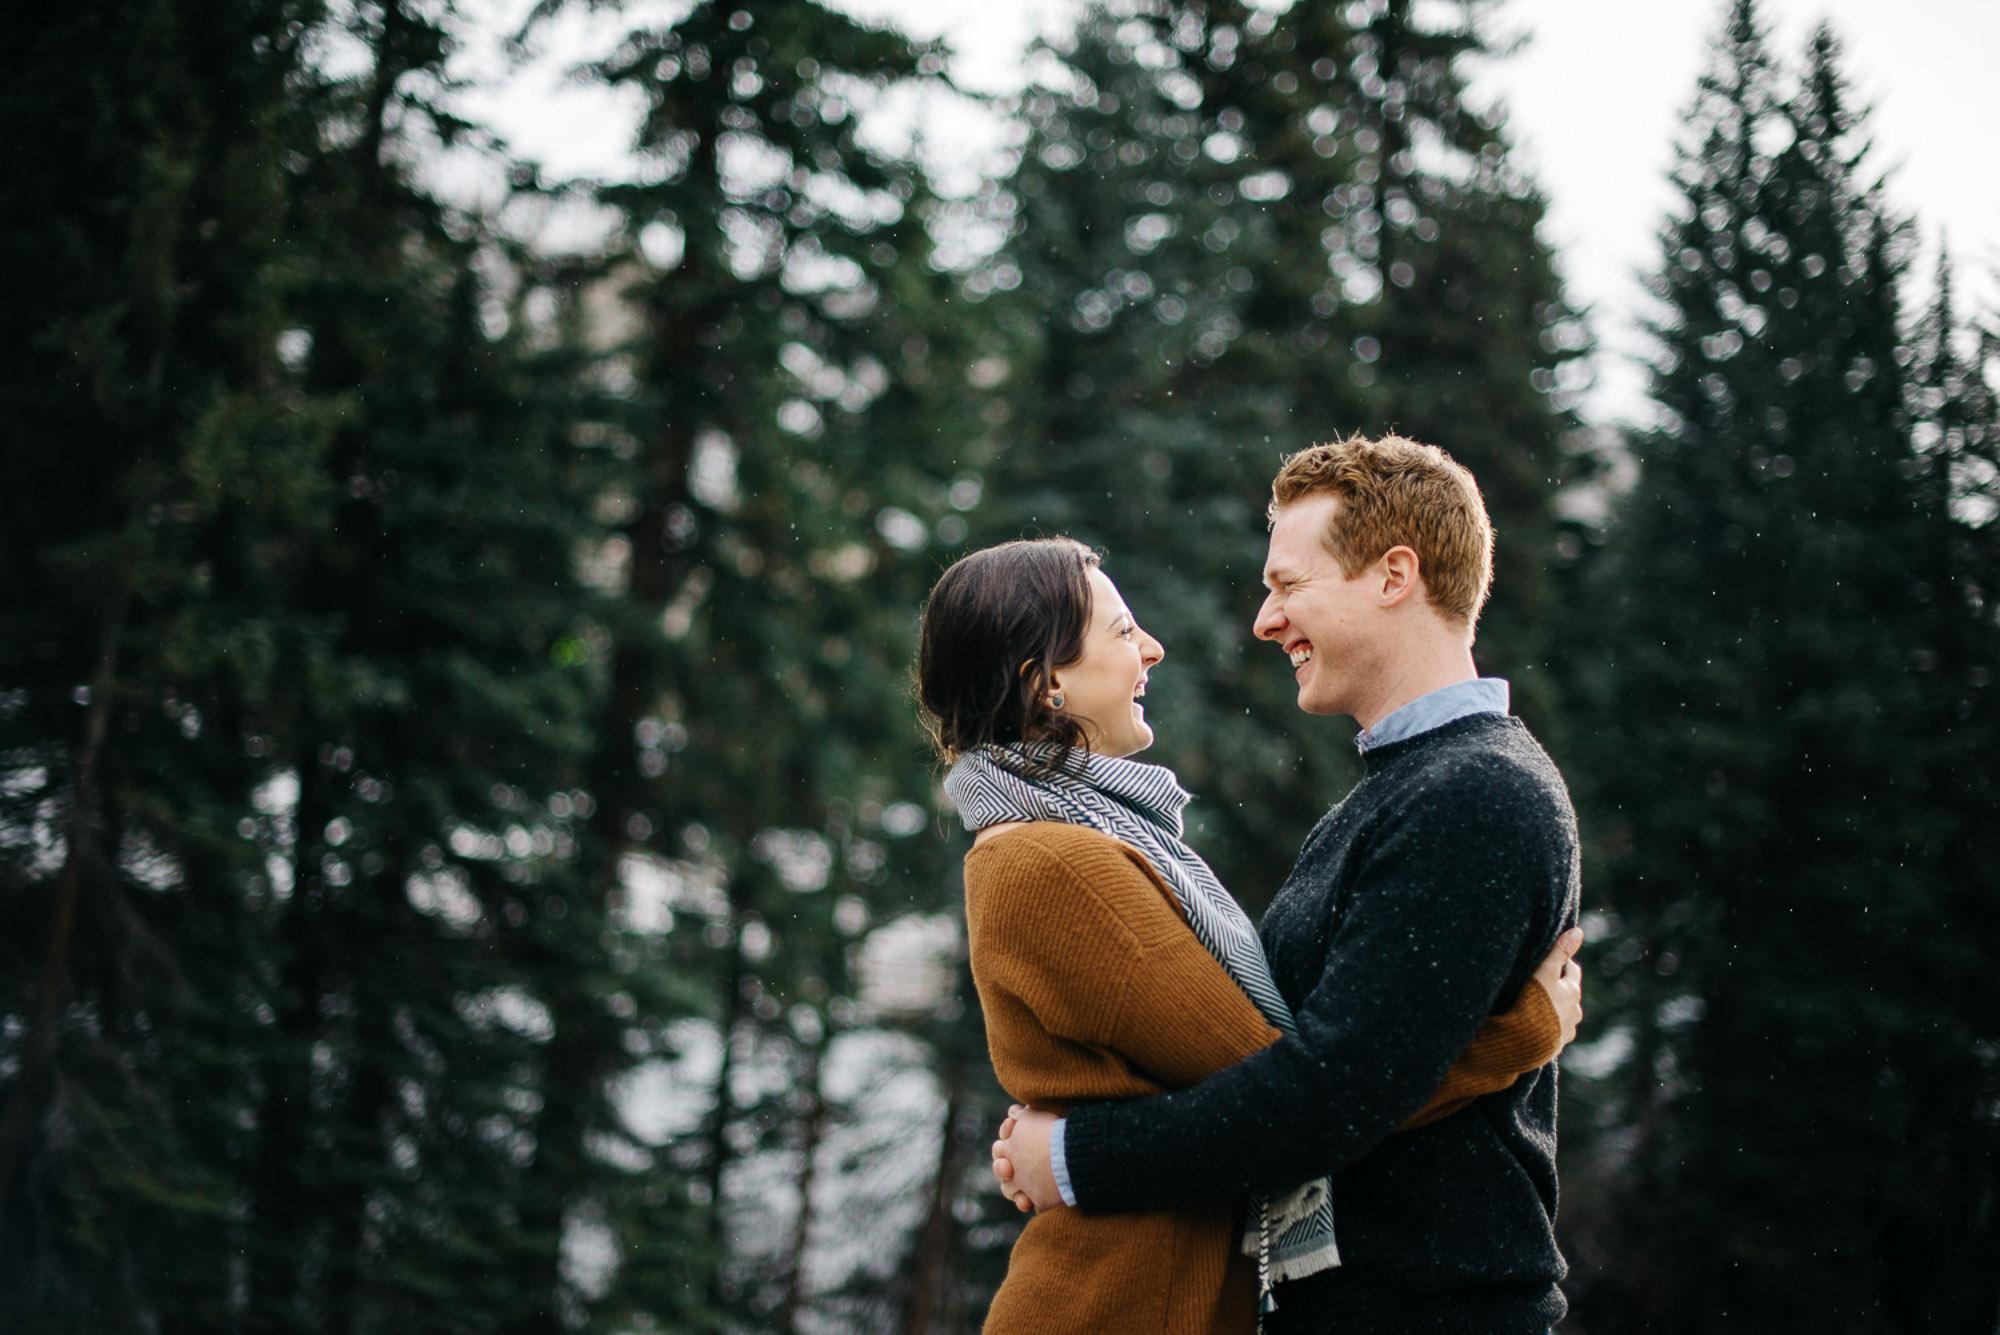 33-26couple-anniversary-engagement-photographer-colorado-mountain-wedding-photographer-vail-engagement-photos-danielle&mark_engagement084.jpg